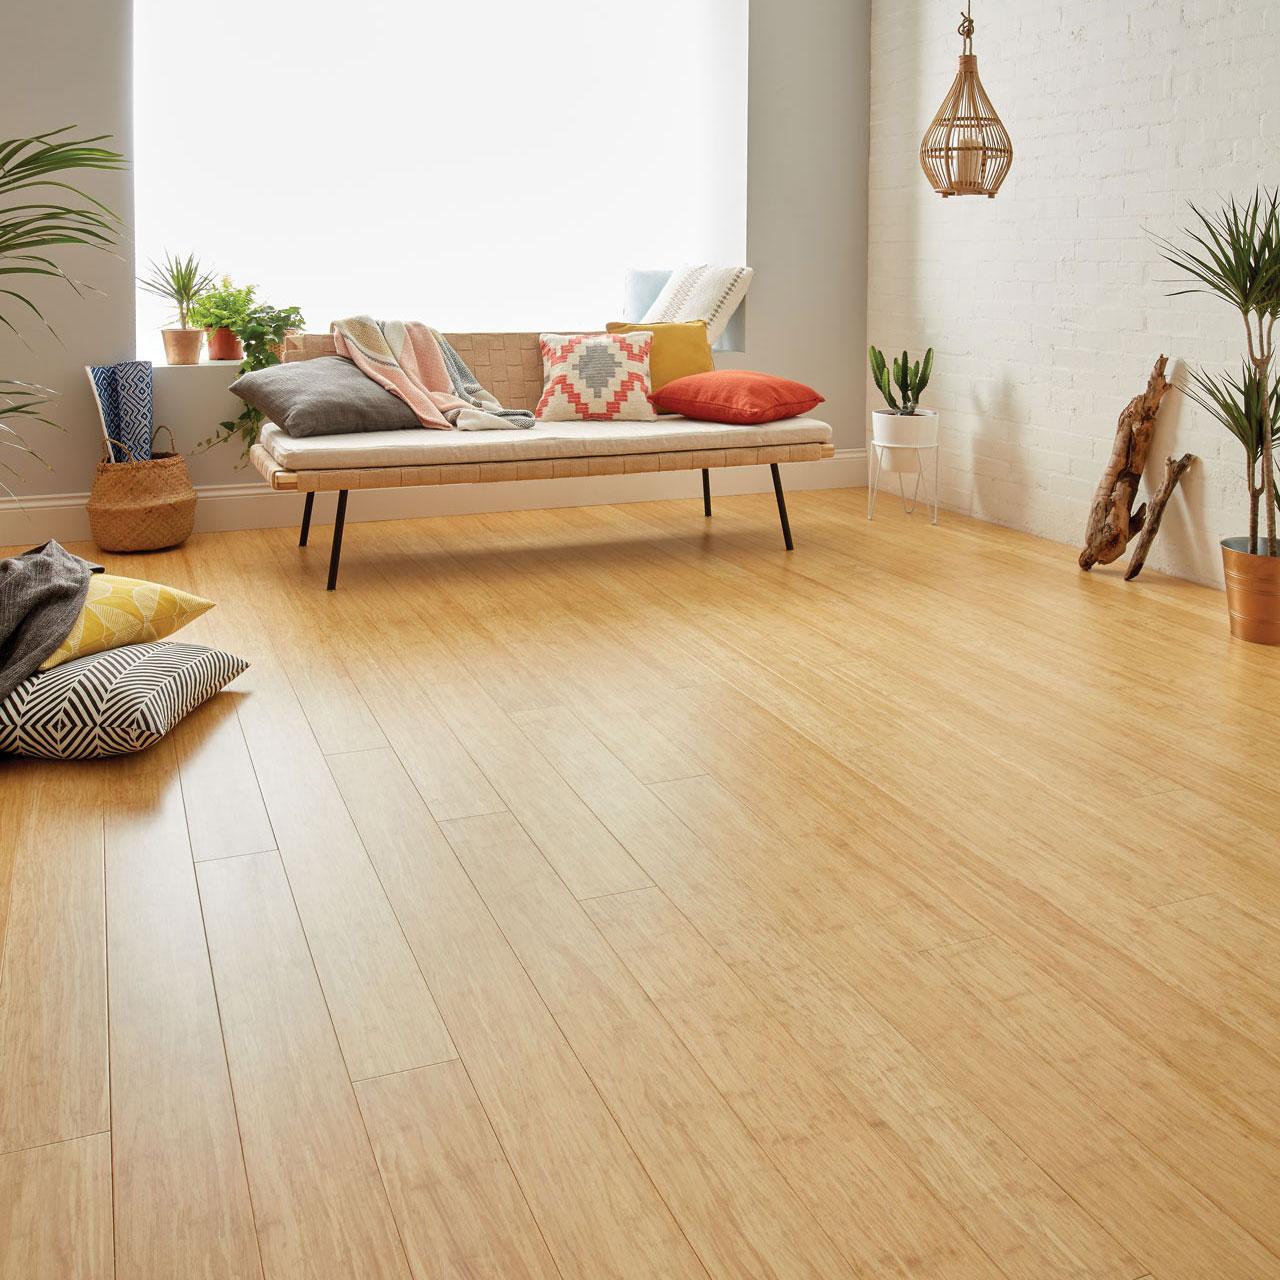 Proper Installation Techniques of Laminated Floors